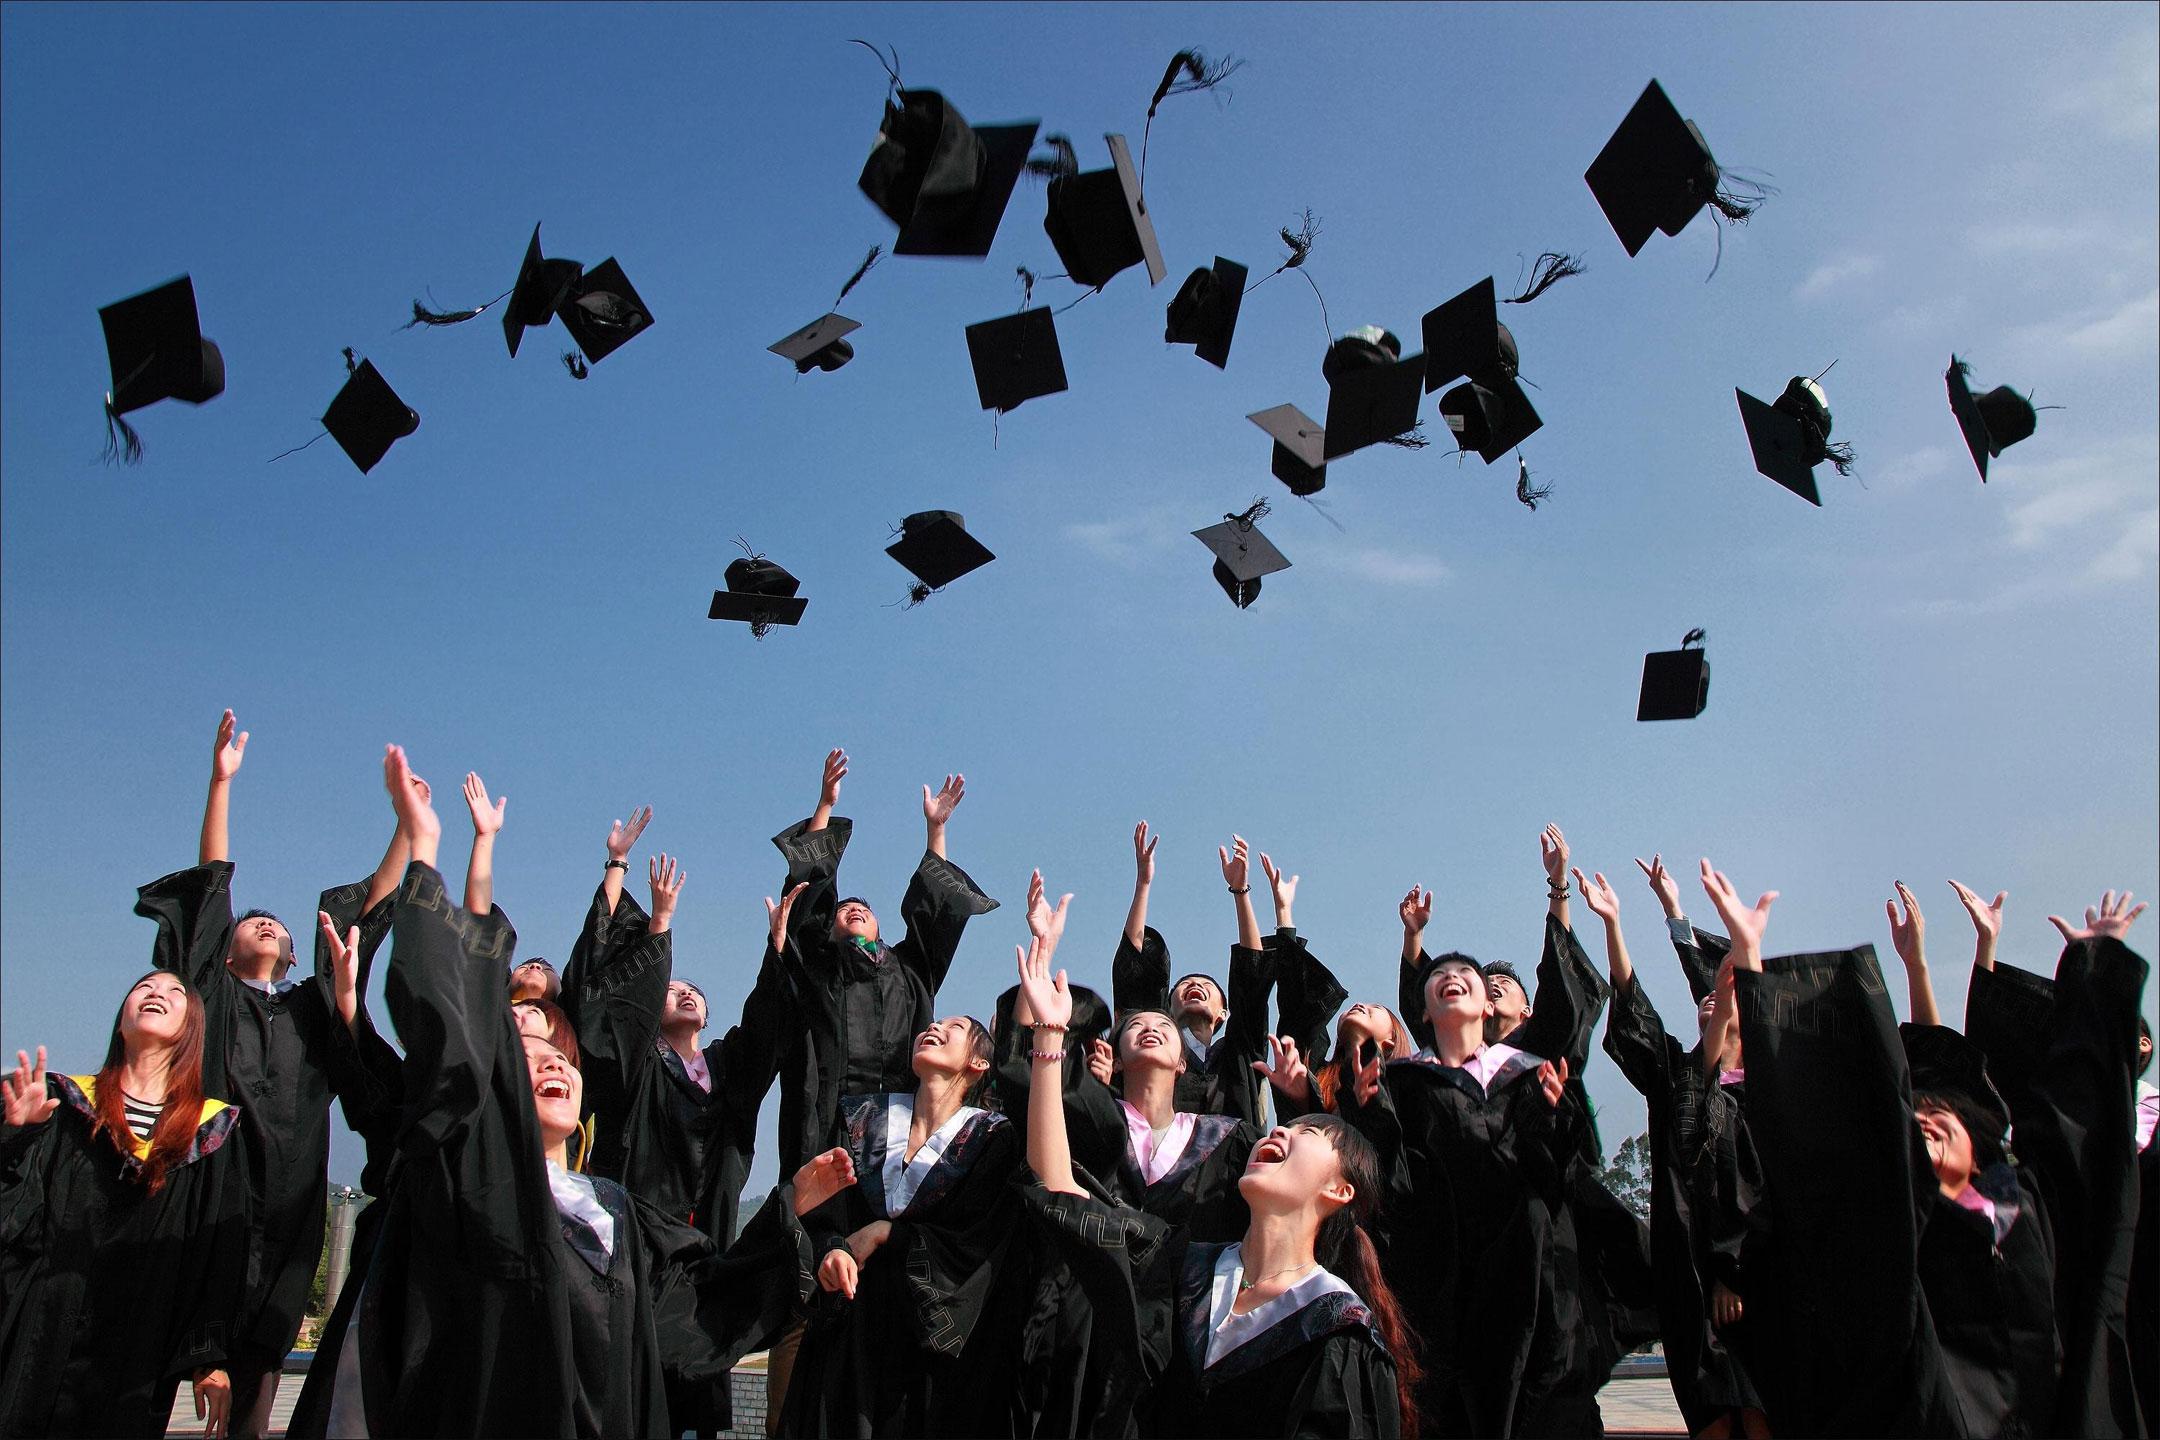 graduation-ceremony-hats-up2160